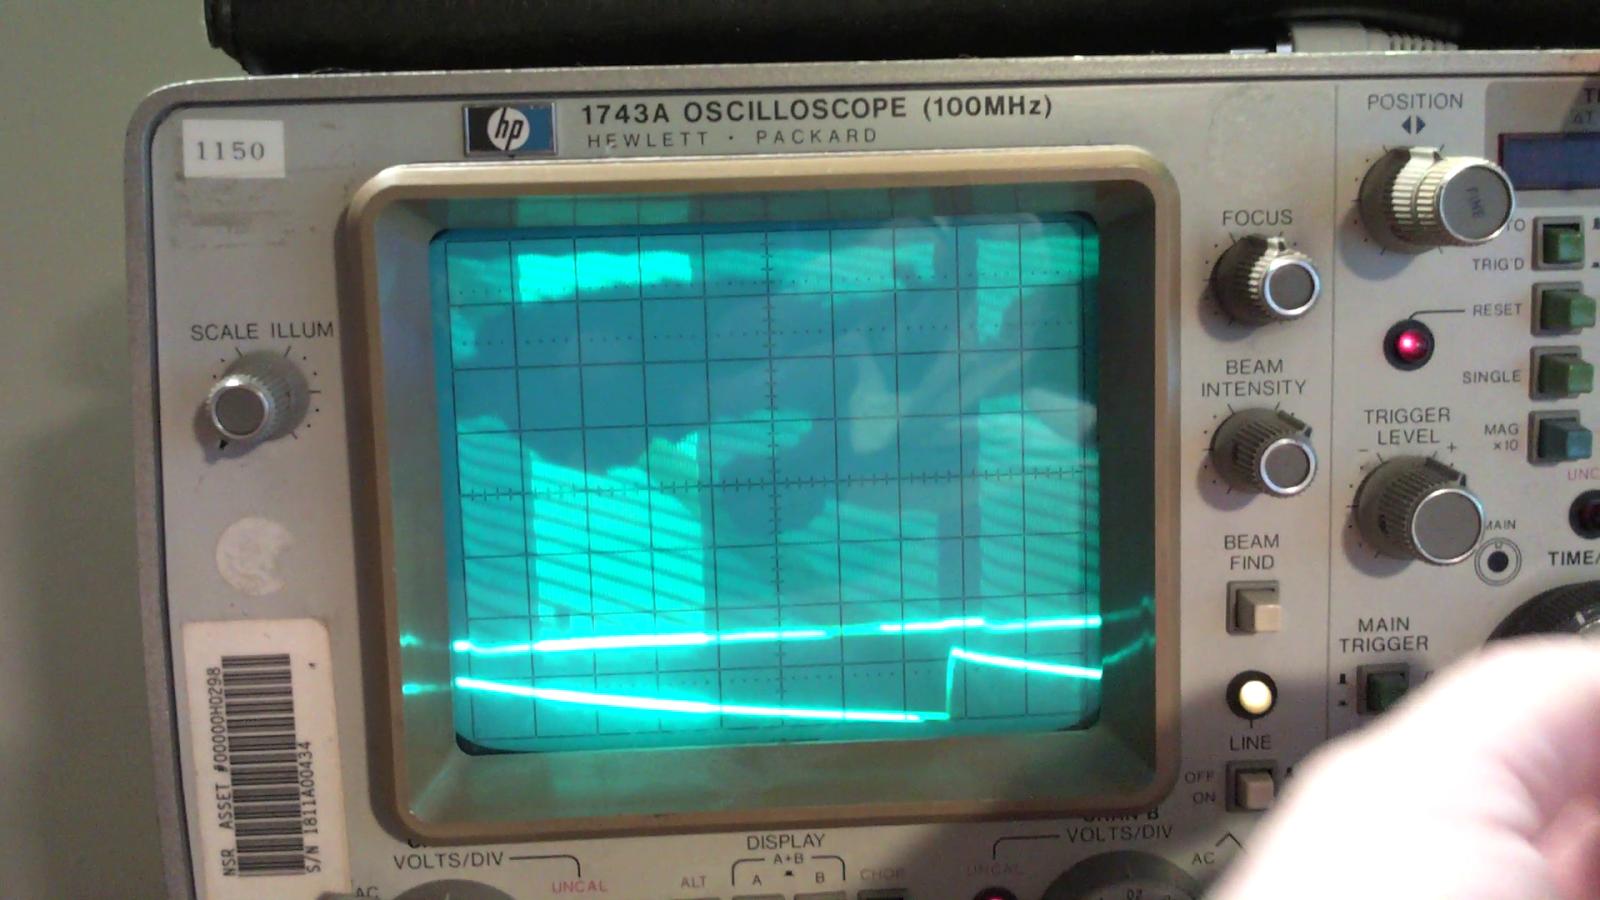 Creating a Raster Monitor from an Oscilloscope | DMC, Inc